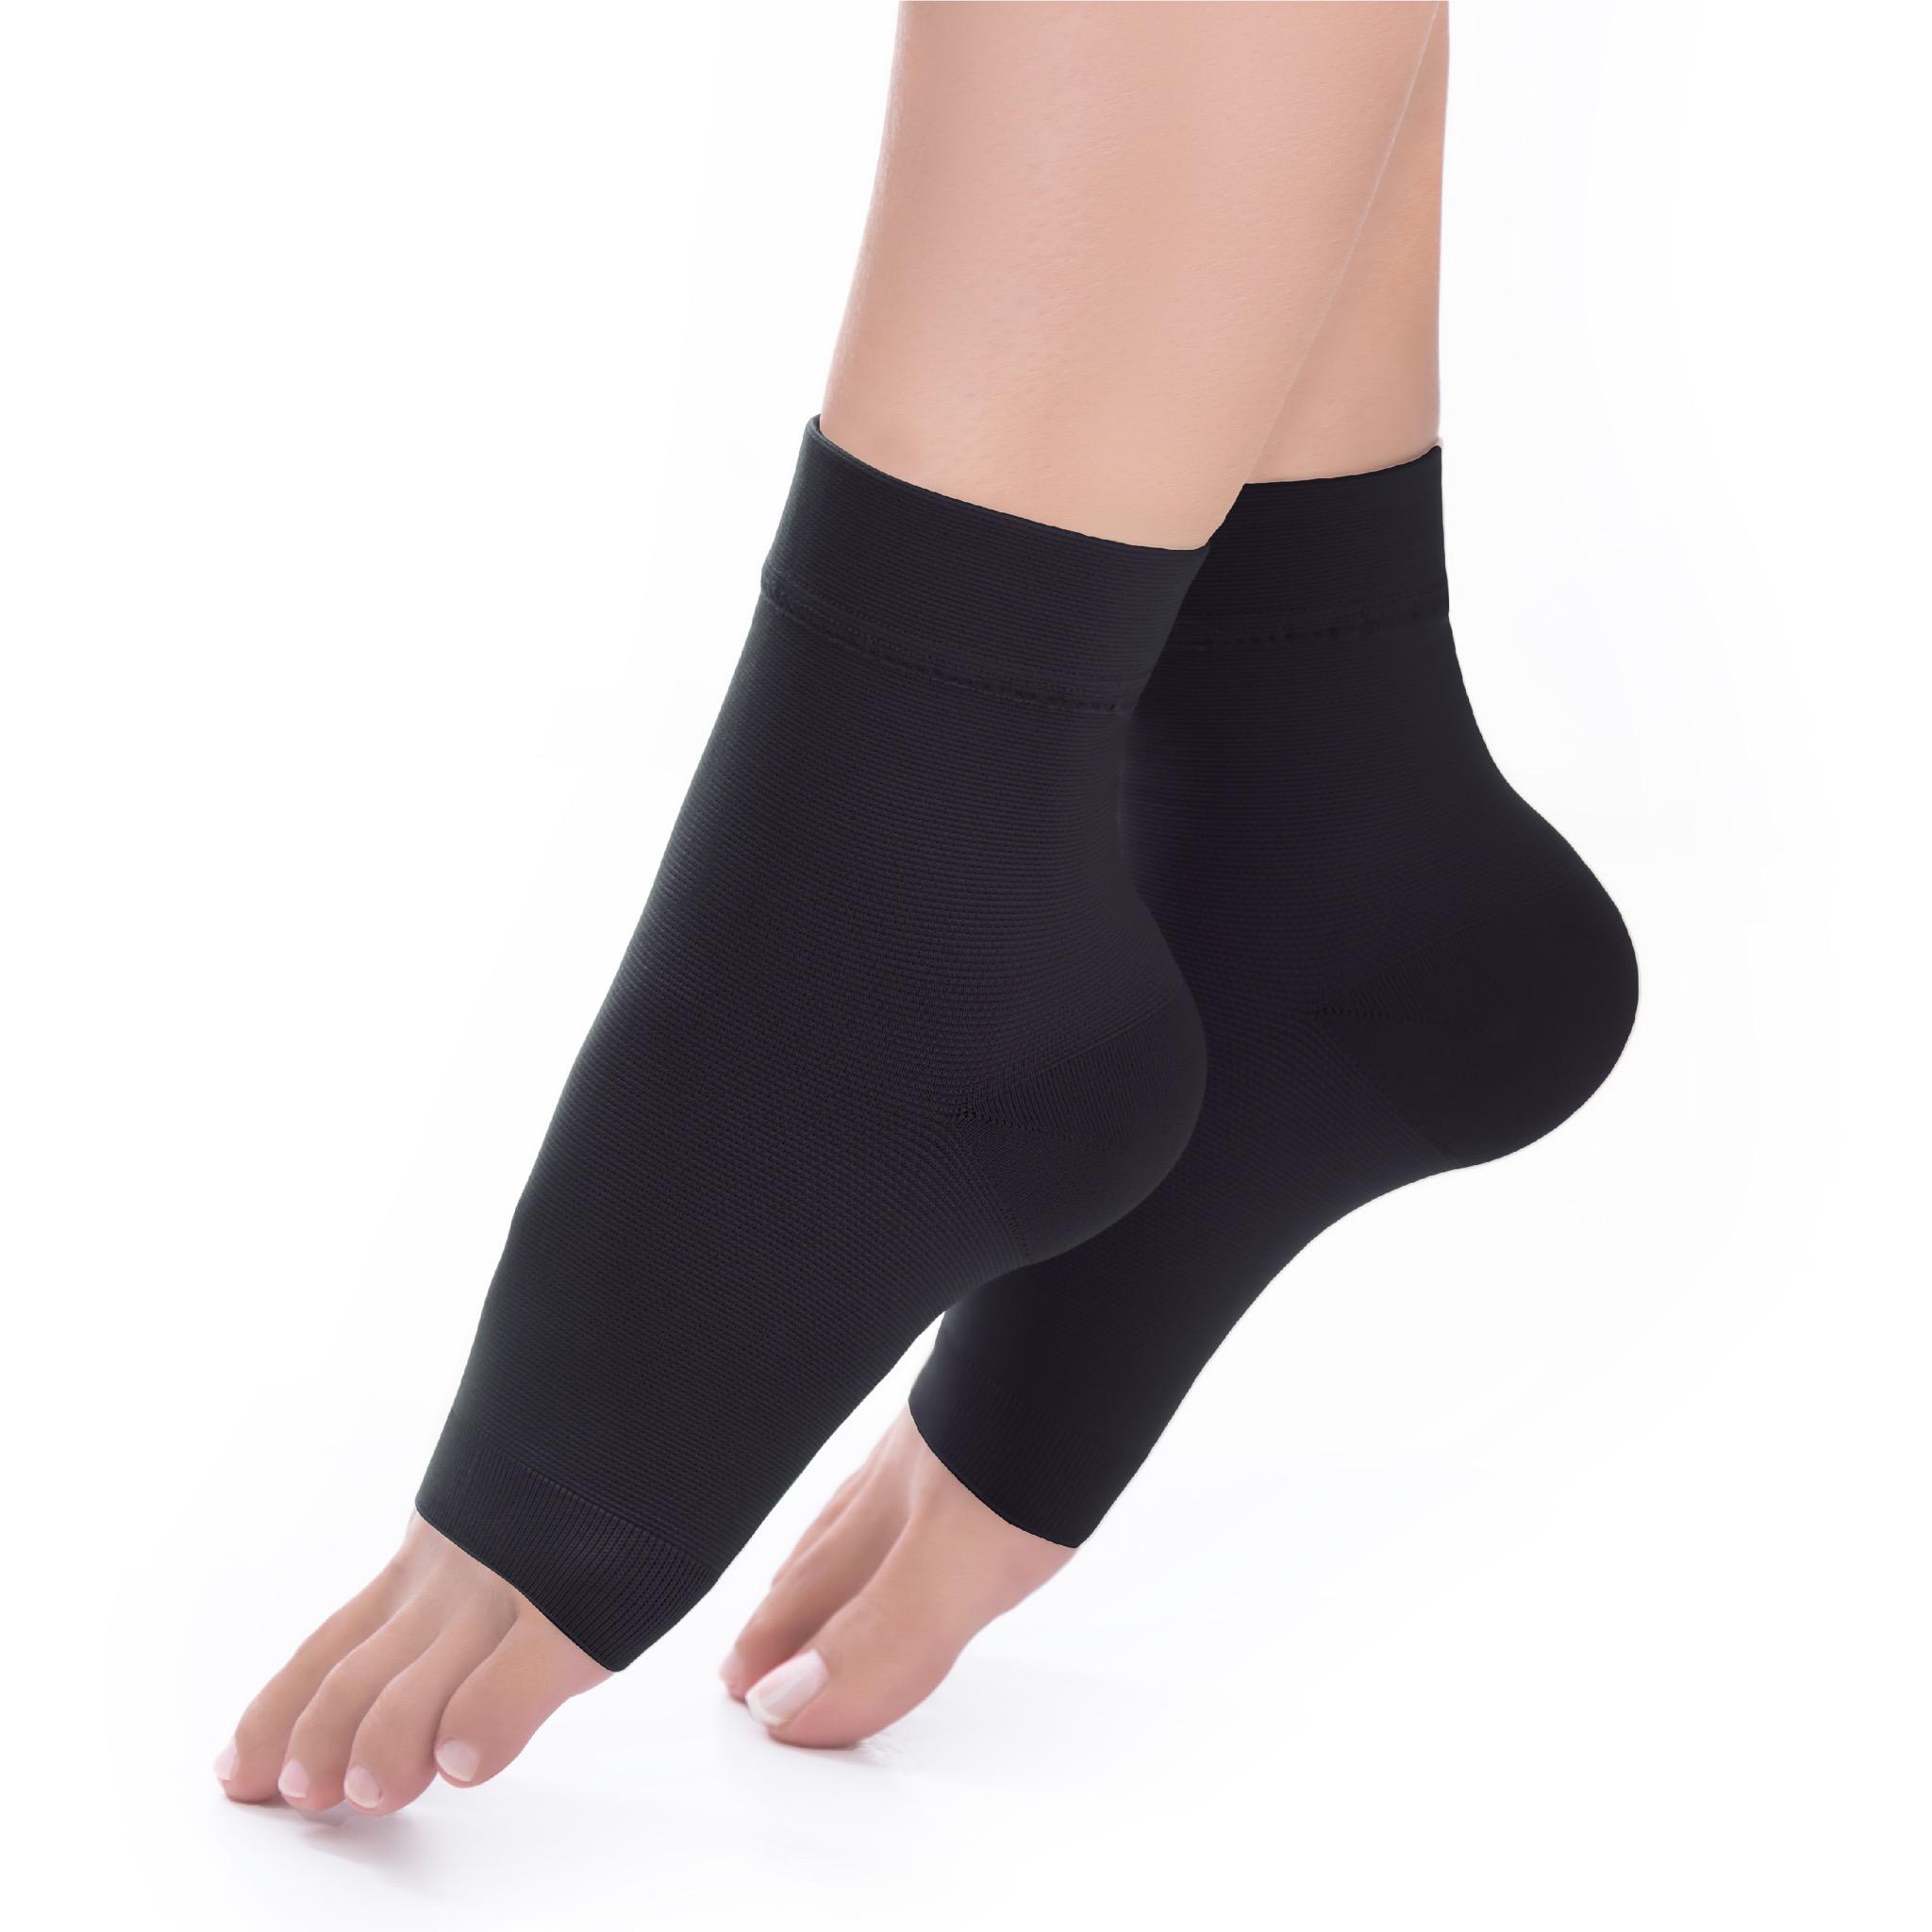 Ankle Sleeves ปลอกกระชับข้อเท้า รหัส IMAH01 สีดำ